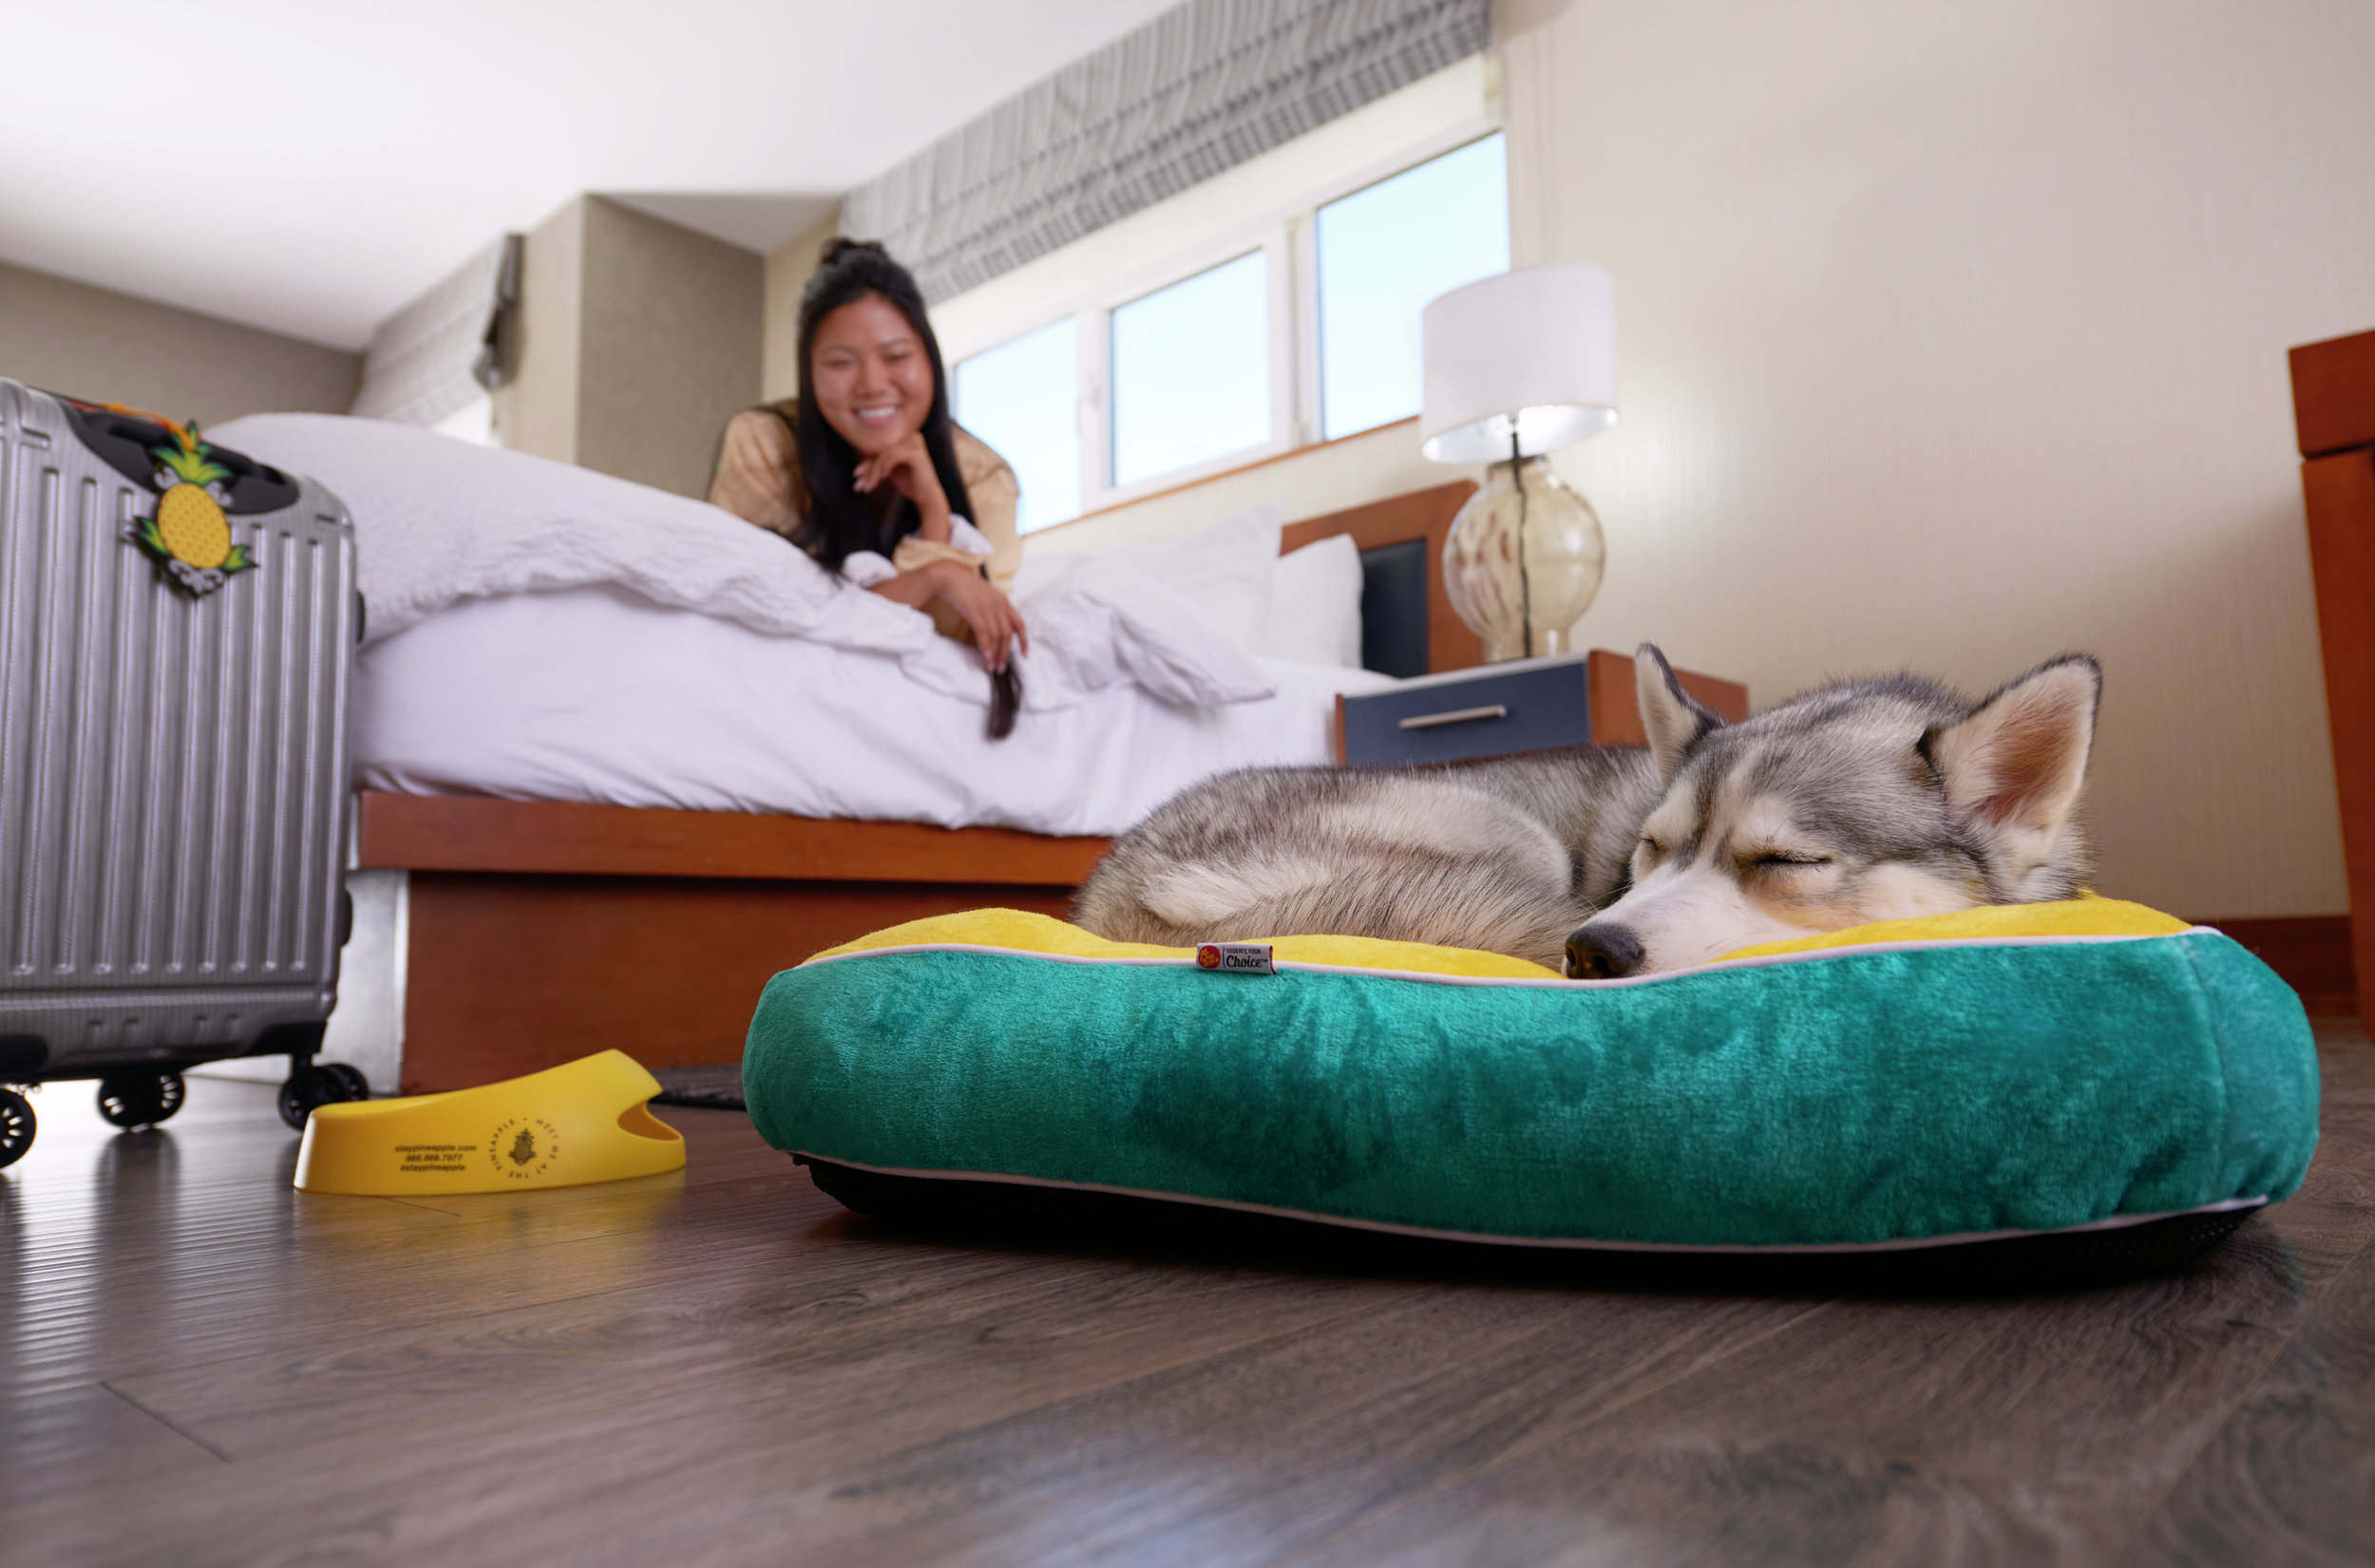 Lifestyle-2017-husky-dog-bed-watertown-room-DSC-1083-3500x2311.jpg